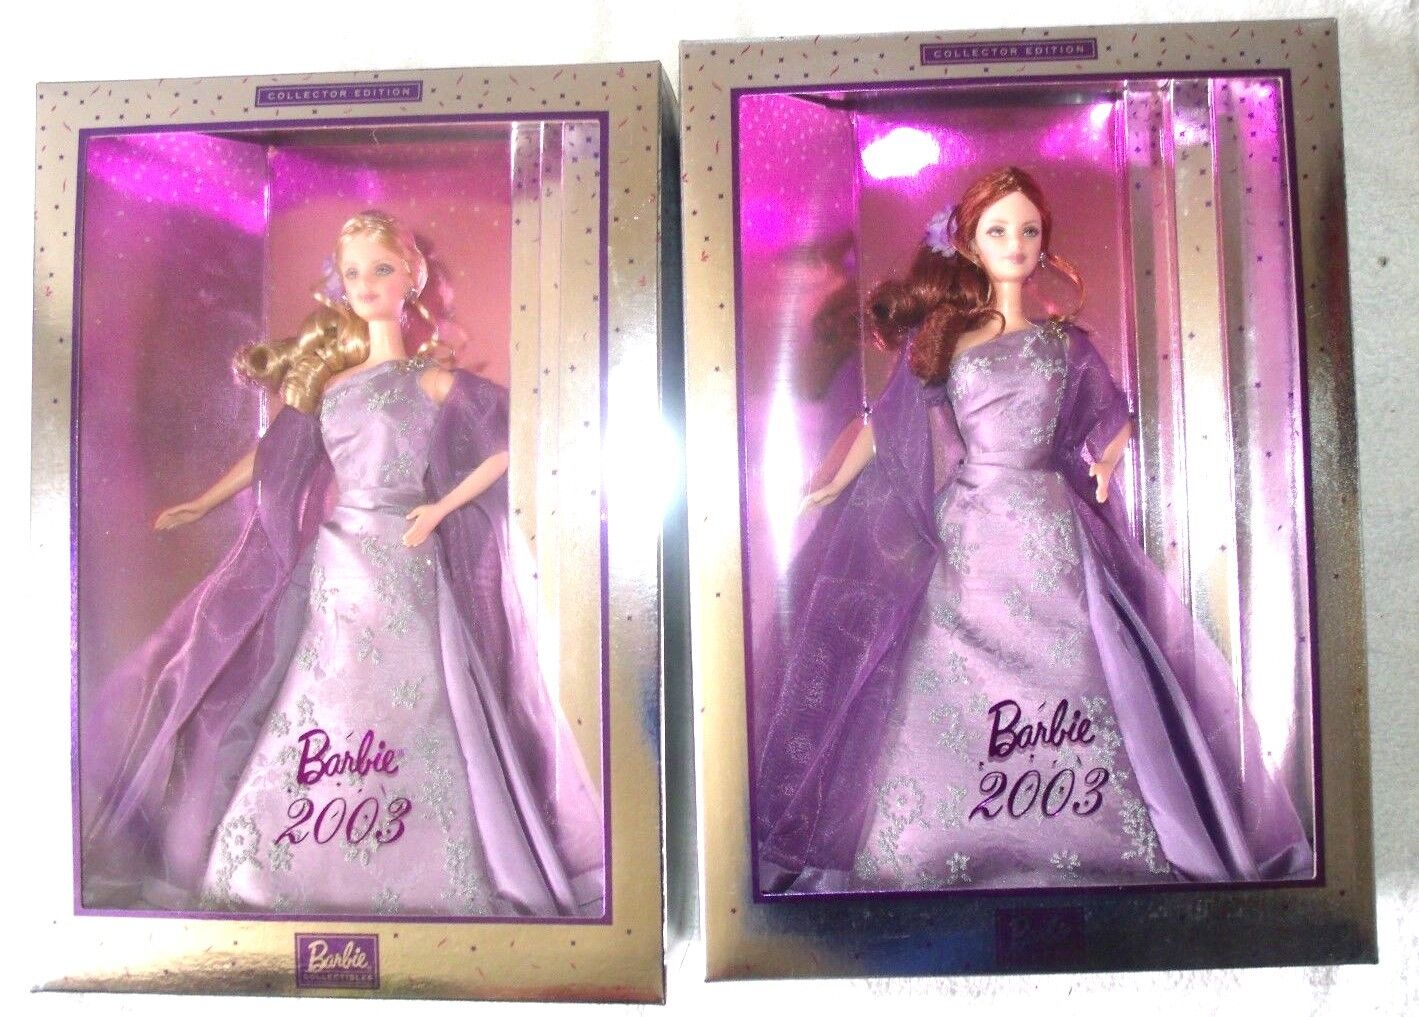 Lote de 2 búsqueda del tesoro pelirroja Lavanda Barbie 2003 colector serie & Rubia